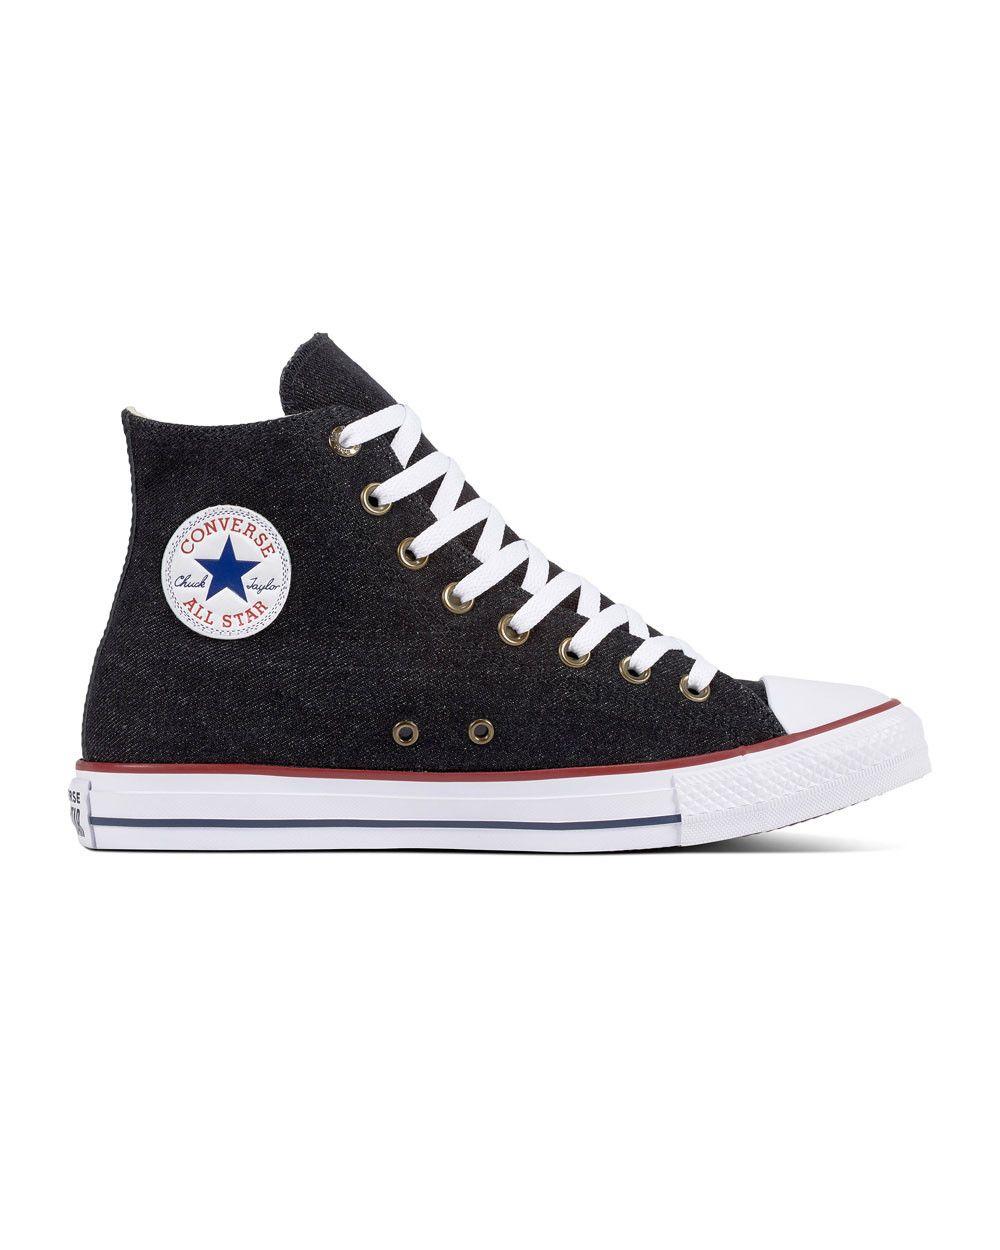 Converse Chuck Taylor Hi (blackwhitebrown) size 131415